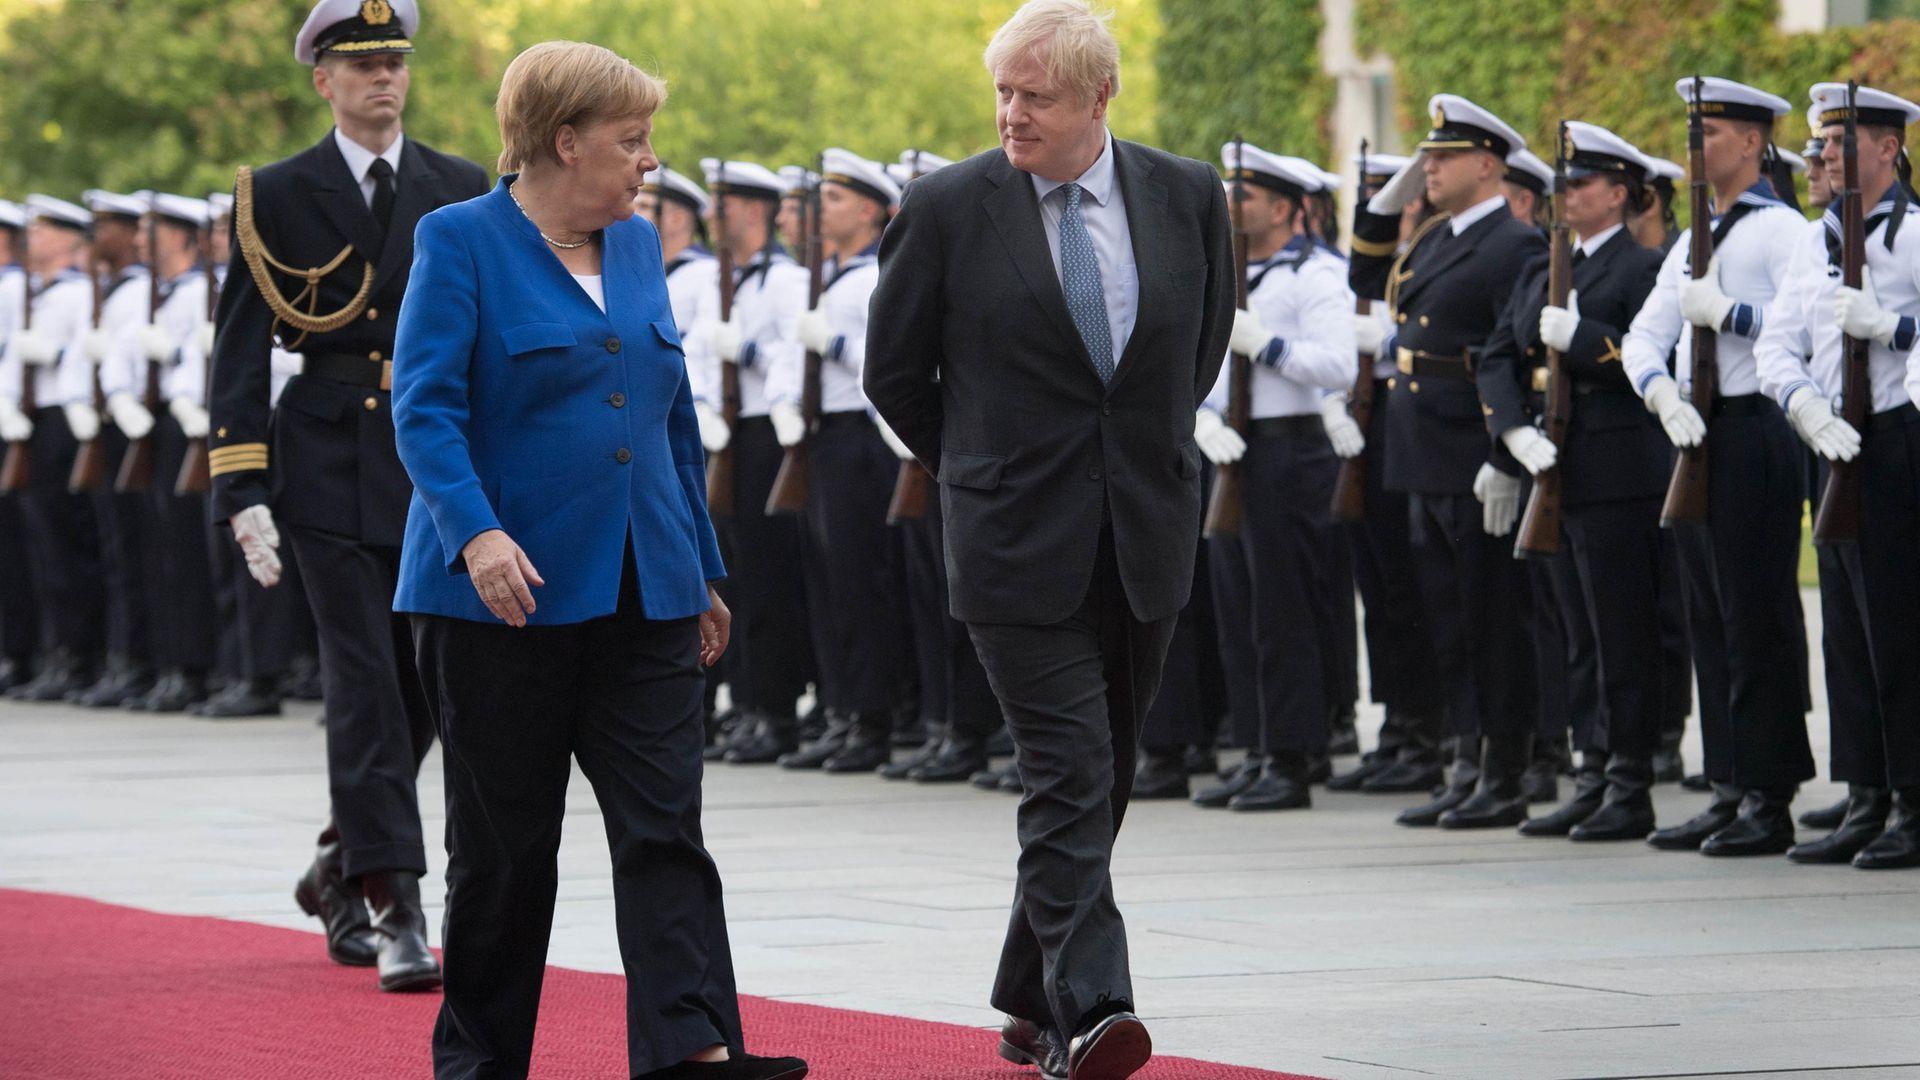 Prime Minister Boris Johnson walks with German Chancellor Angela Merkel in Berlin - Credit: PA